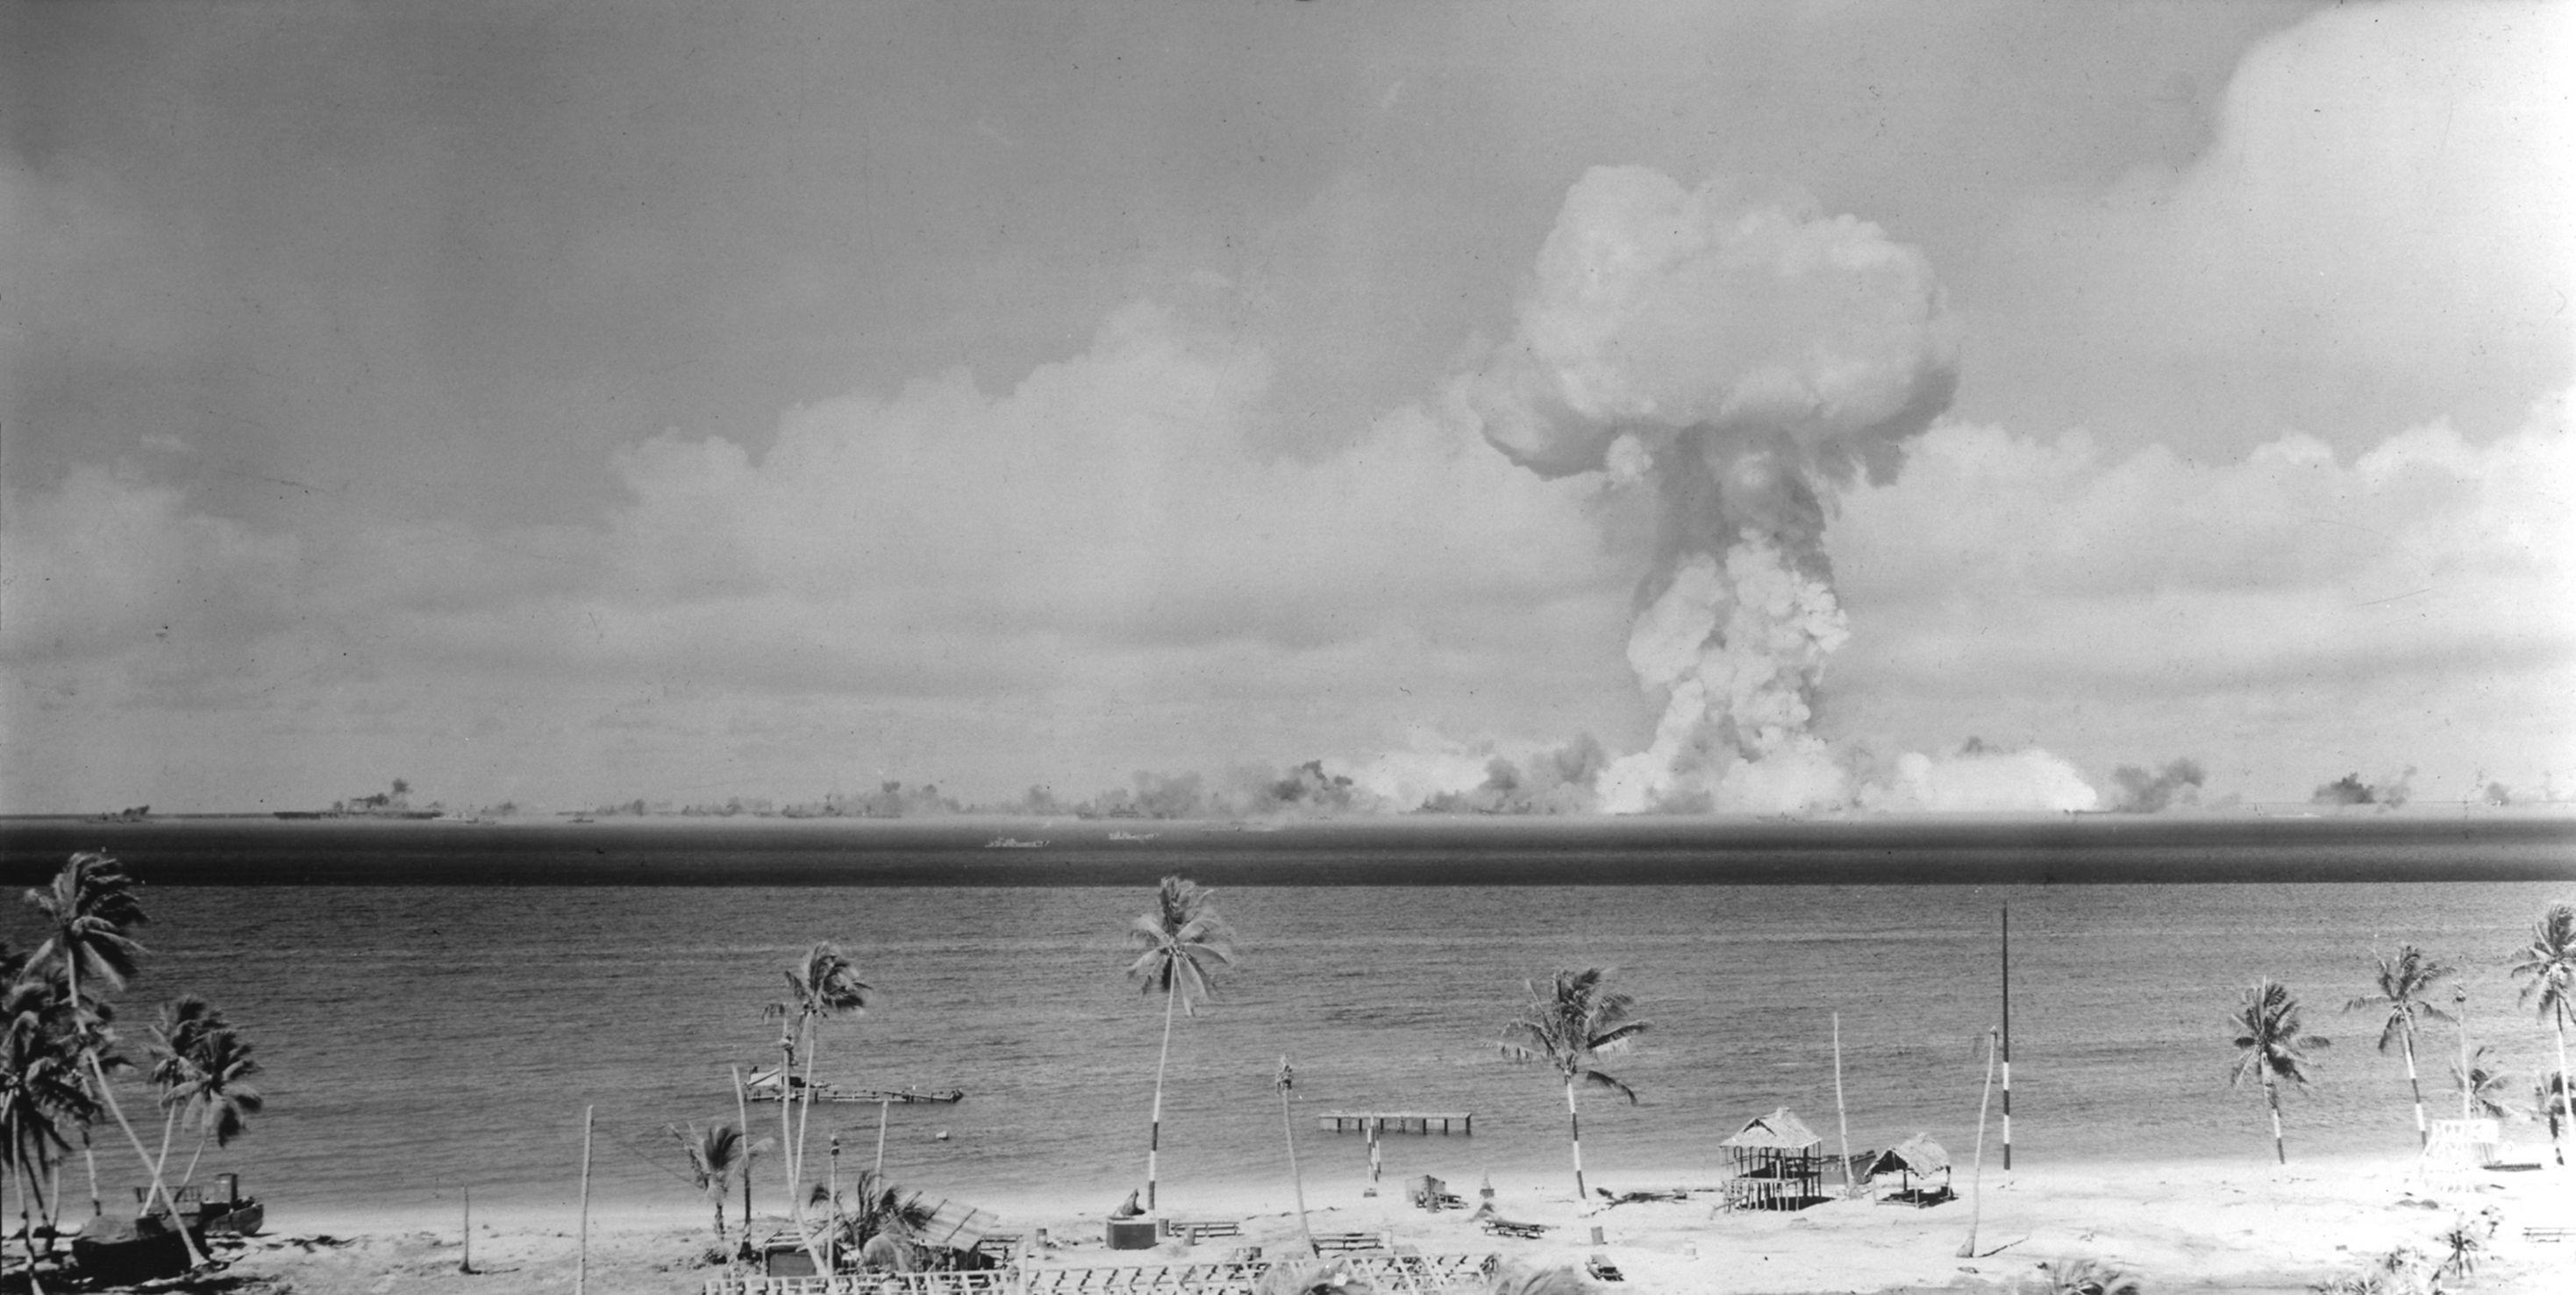 Jolly reccomend Atomic test at bikini atoll